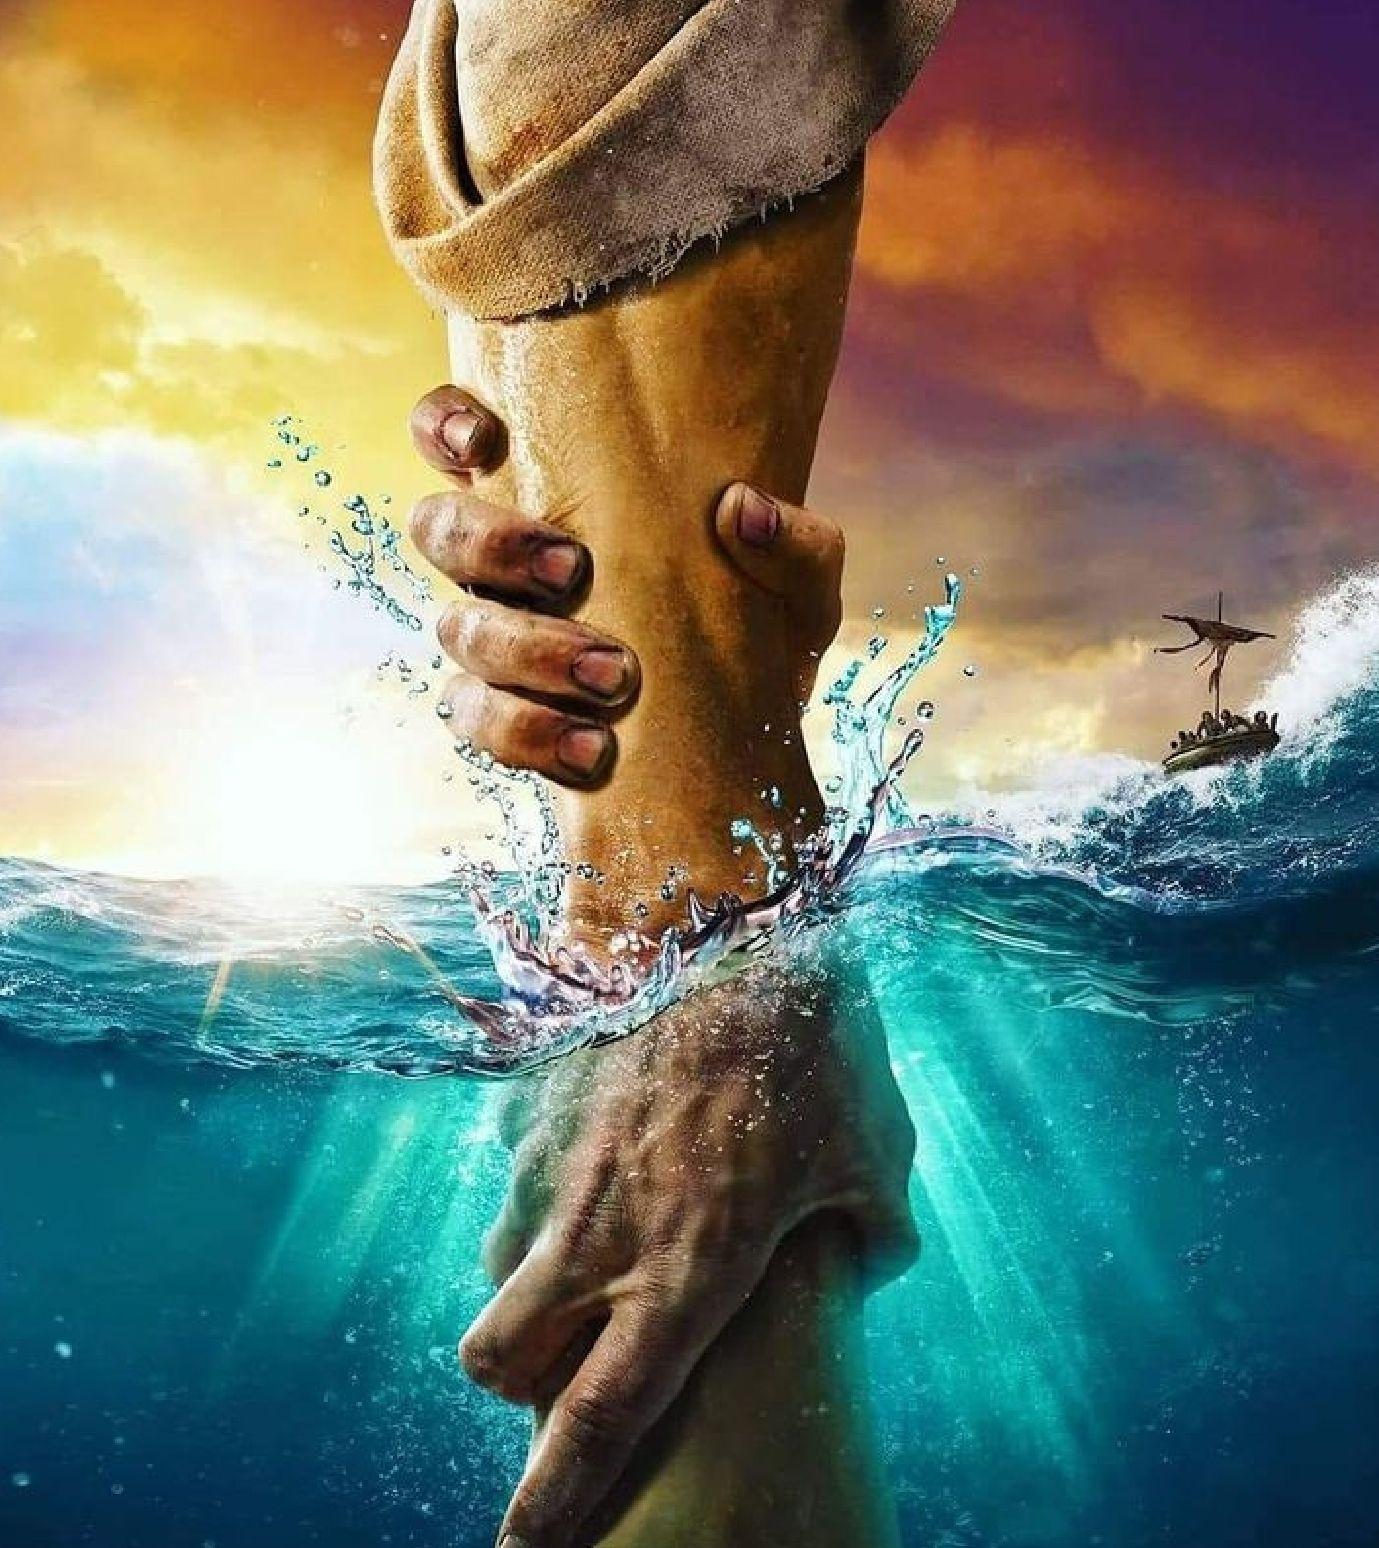 He Will Come And Save You | Jesus christ art, Jesus artwork, Jesus painting